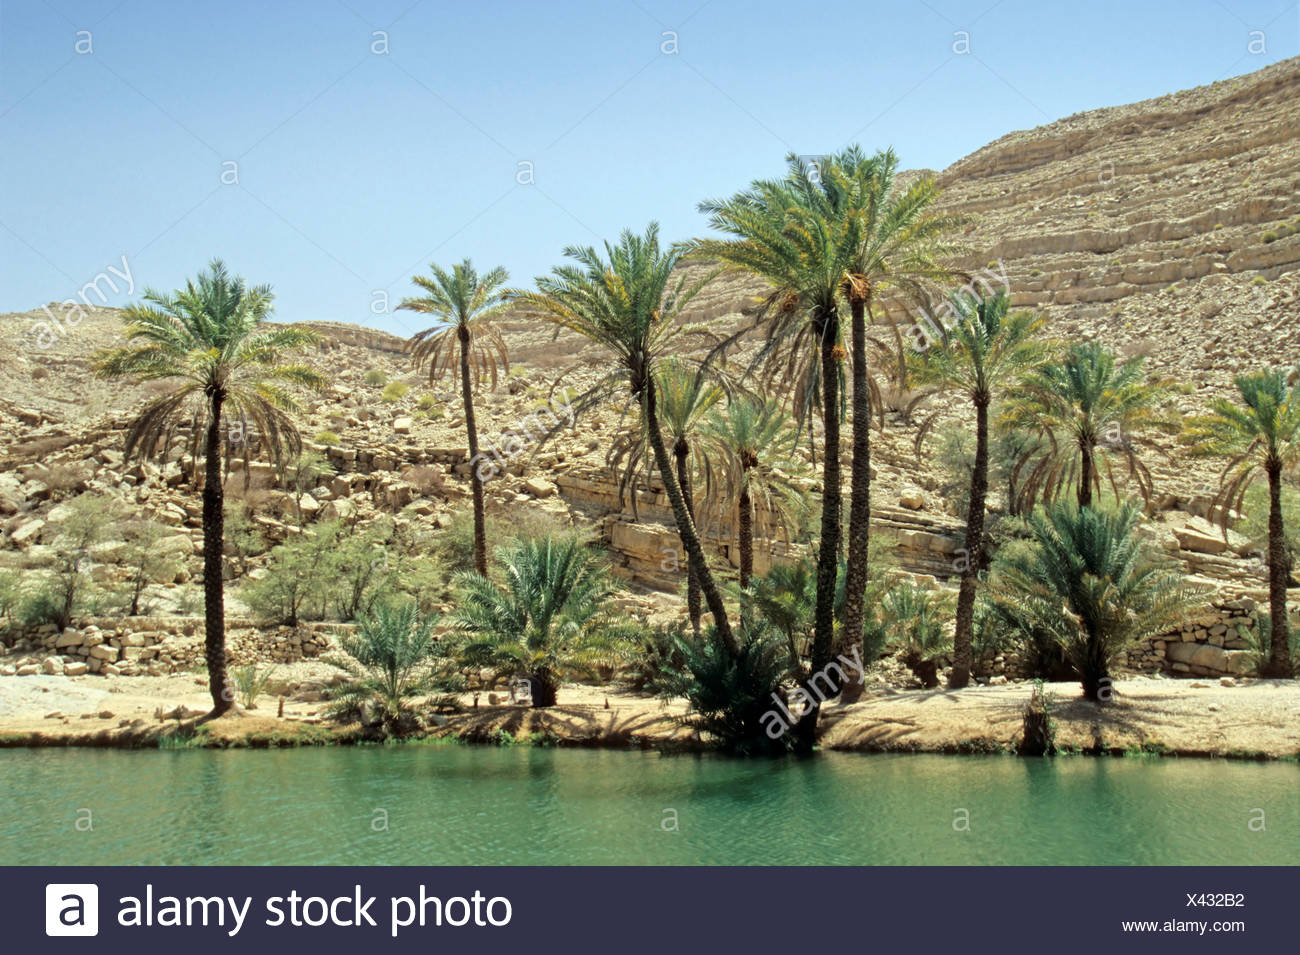 Wadi in a rocky landscape in the Hadjar Mountains, Oman, Arabian Peninsula, Middle East Stock Photo